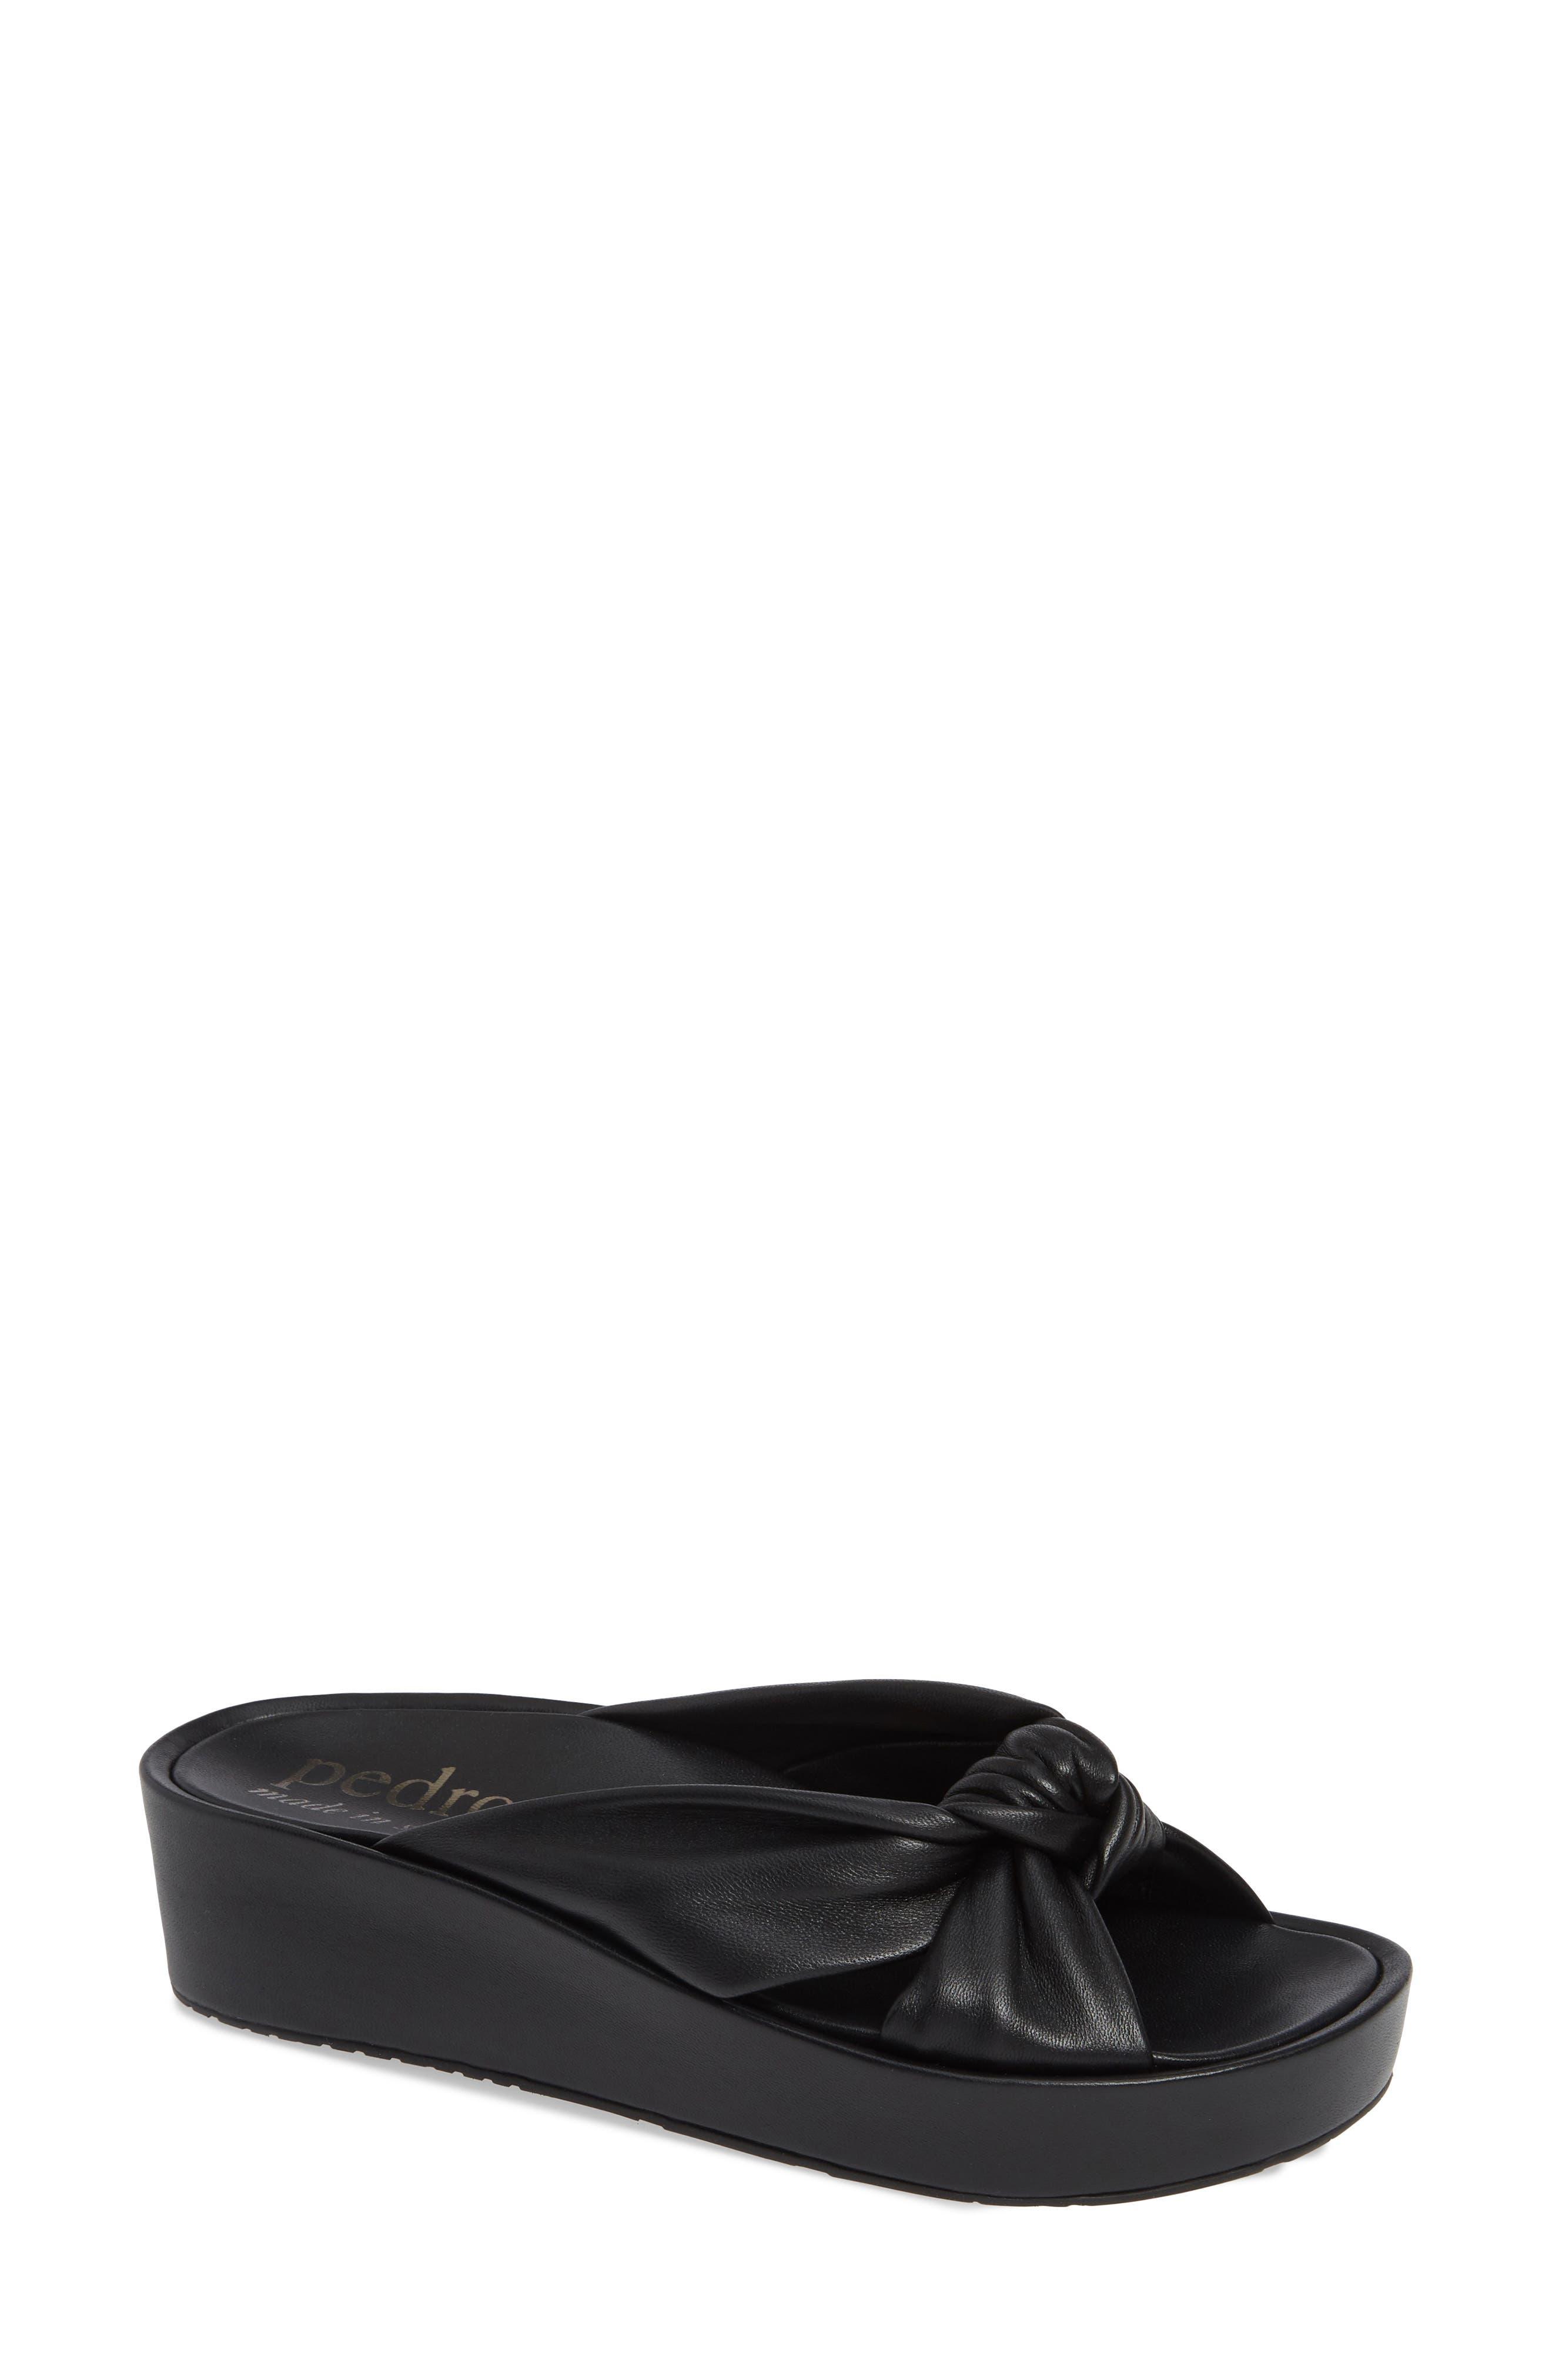 Lany Platform Slide Sandal,                             Main thumbnail 1, color,                             BLACK LEATHER